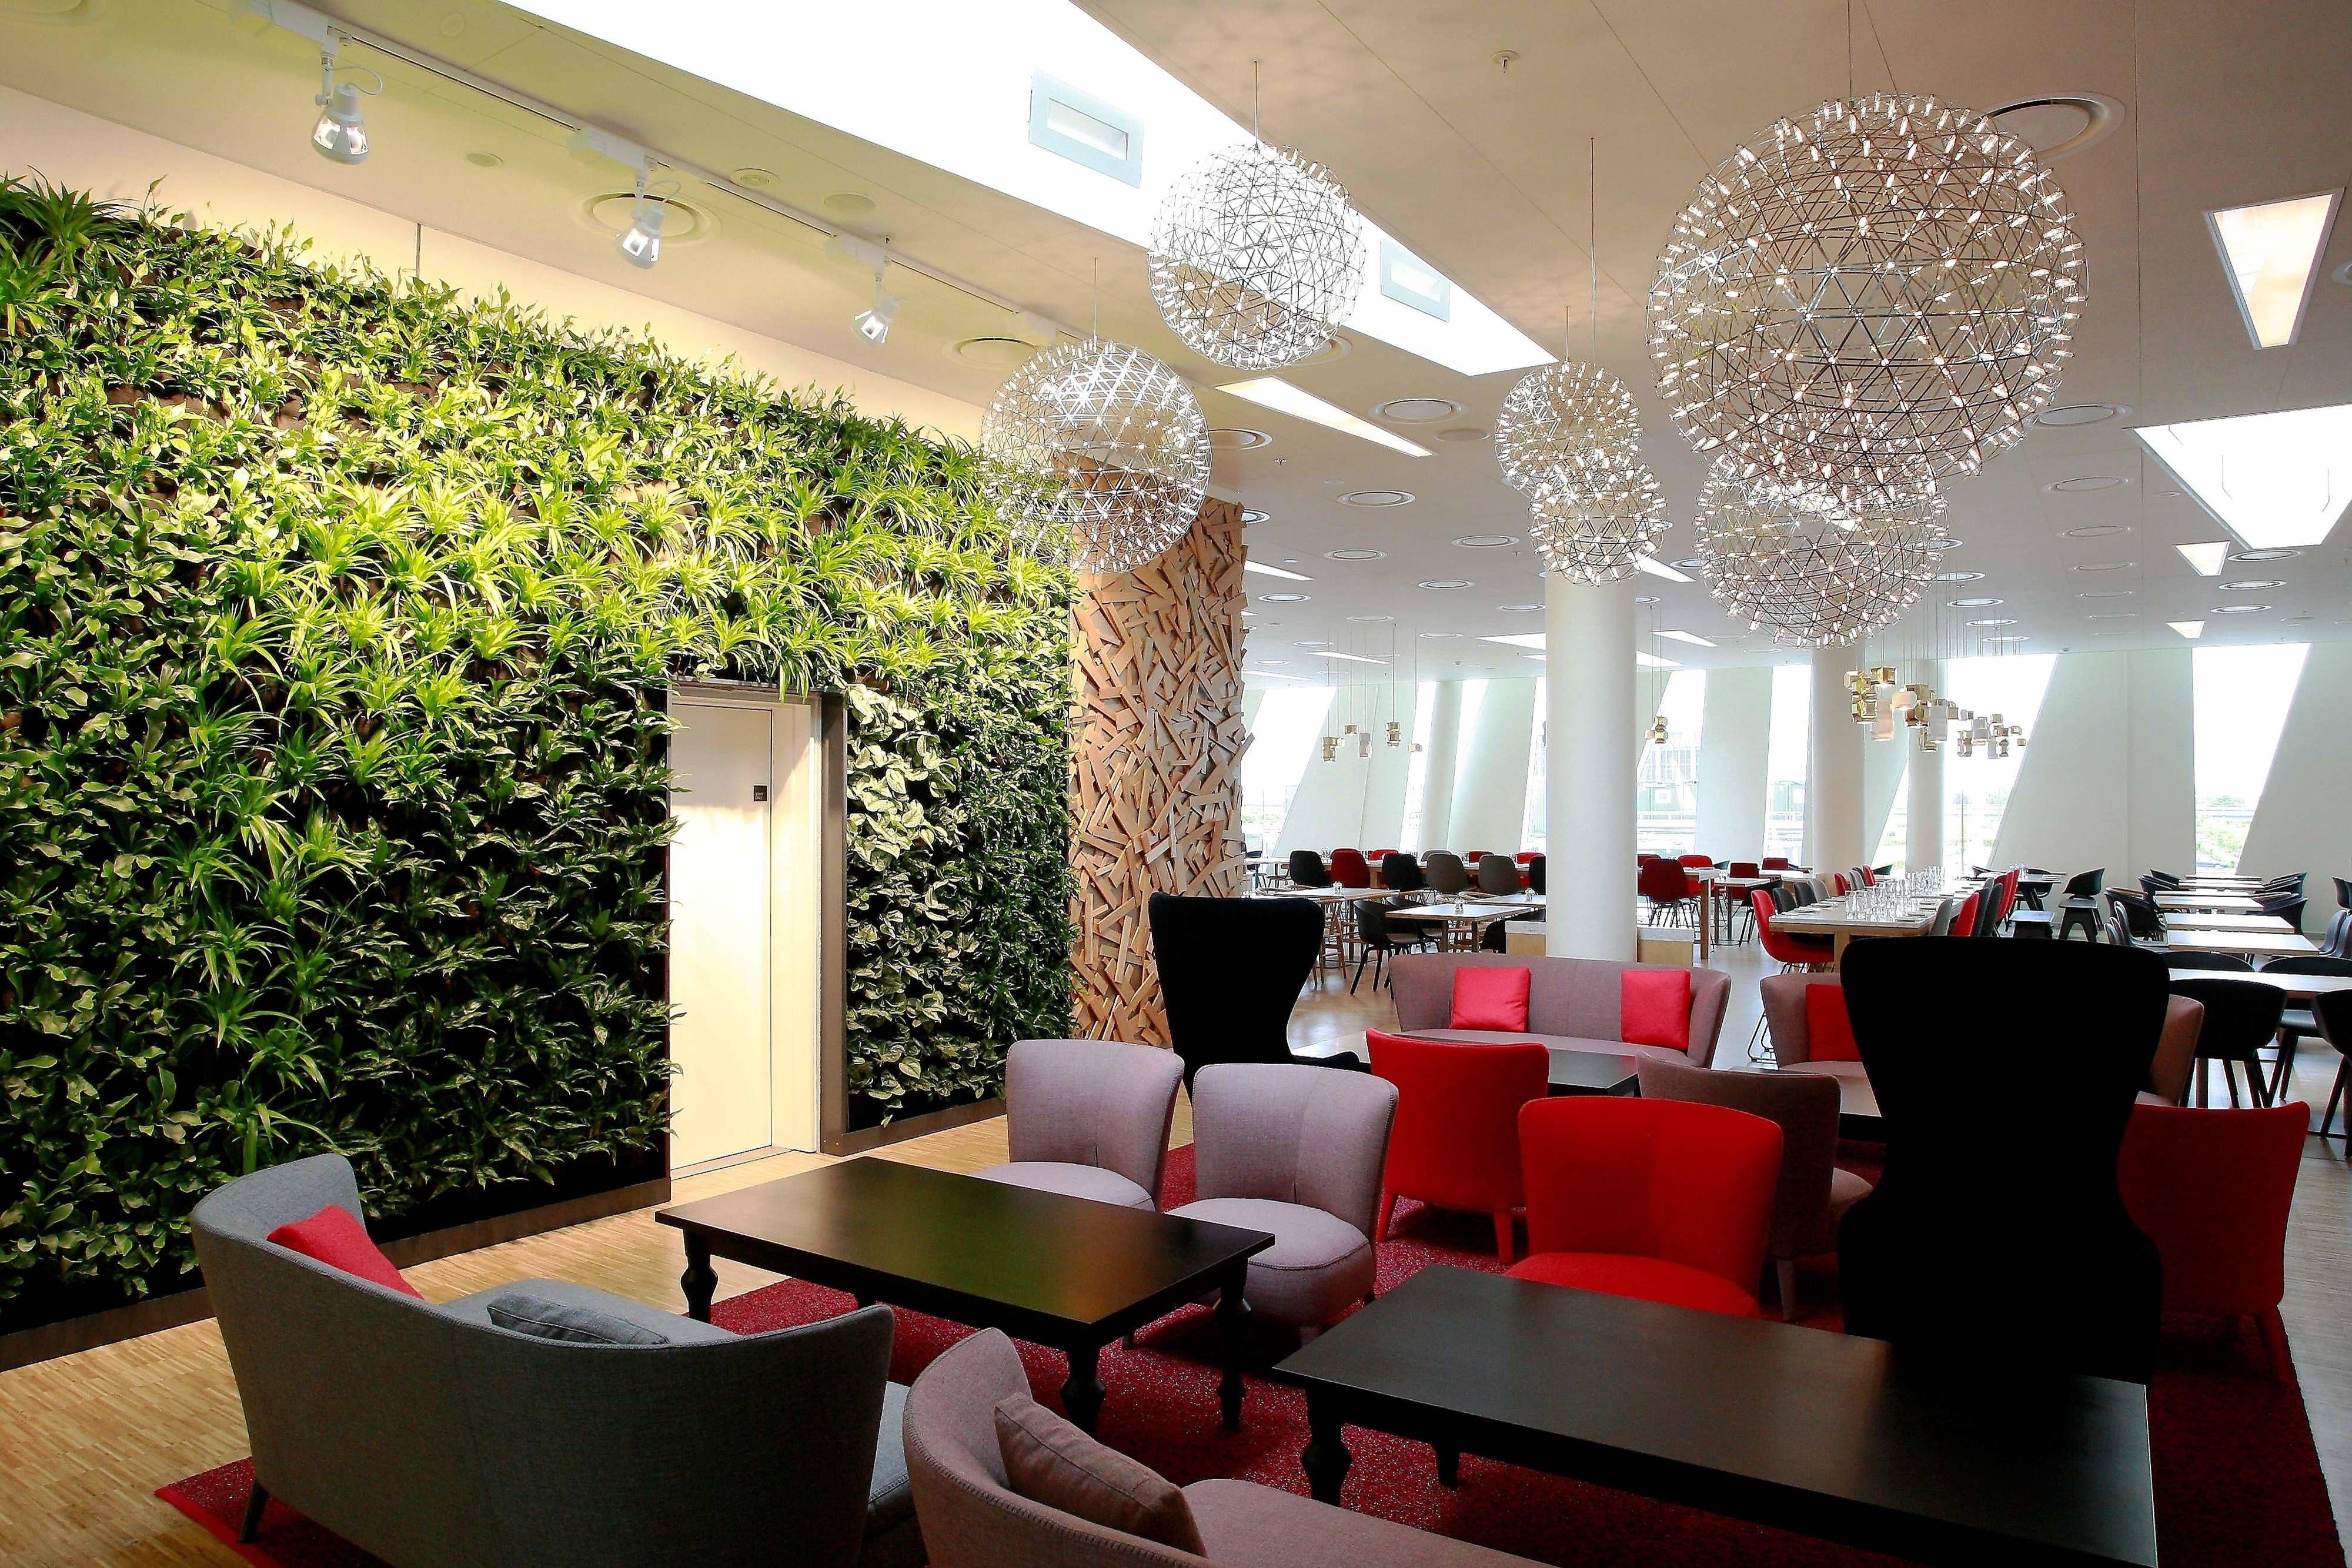 Ac Hotel Bella Sky Copenhagen Bm Restaurant #Holidays, #Beautiful, #Relax,